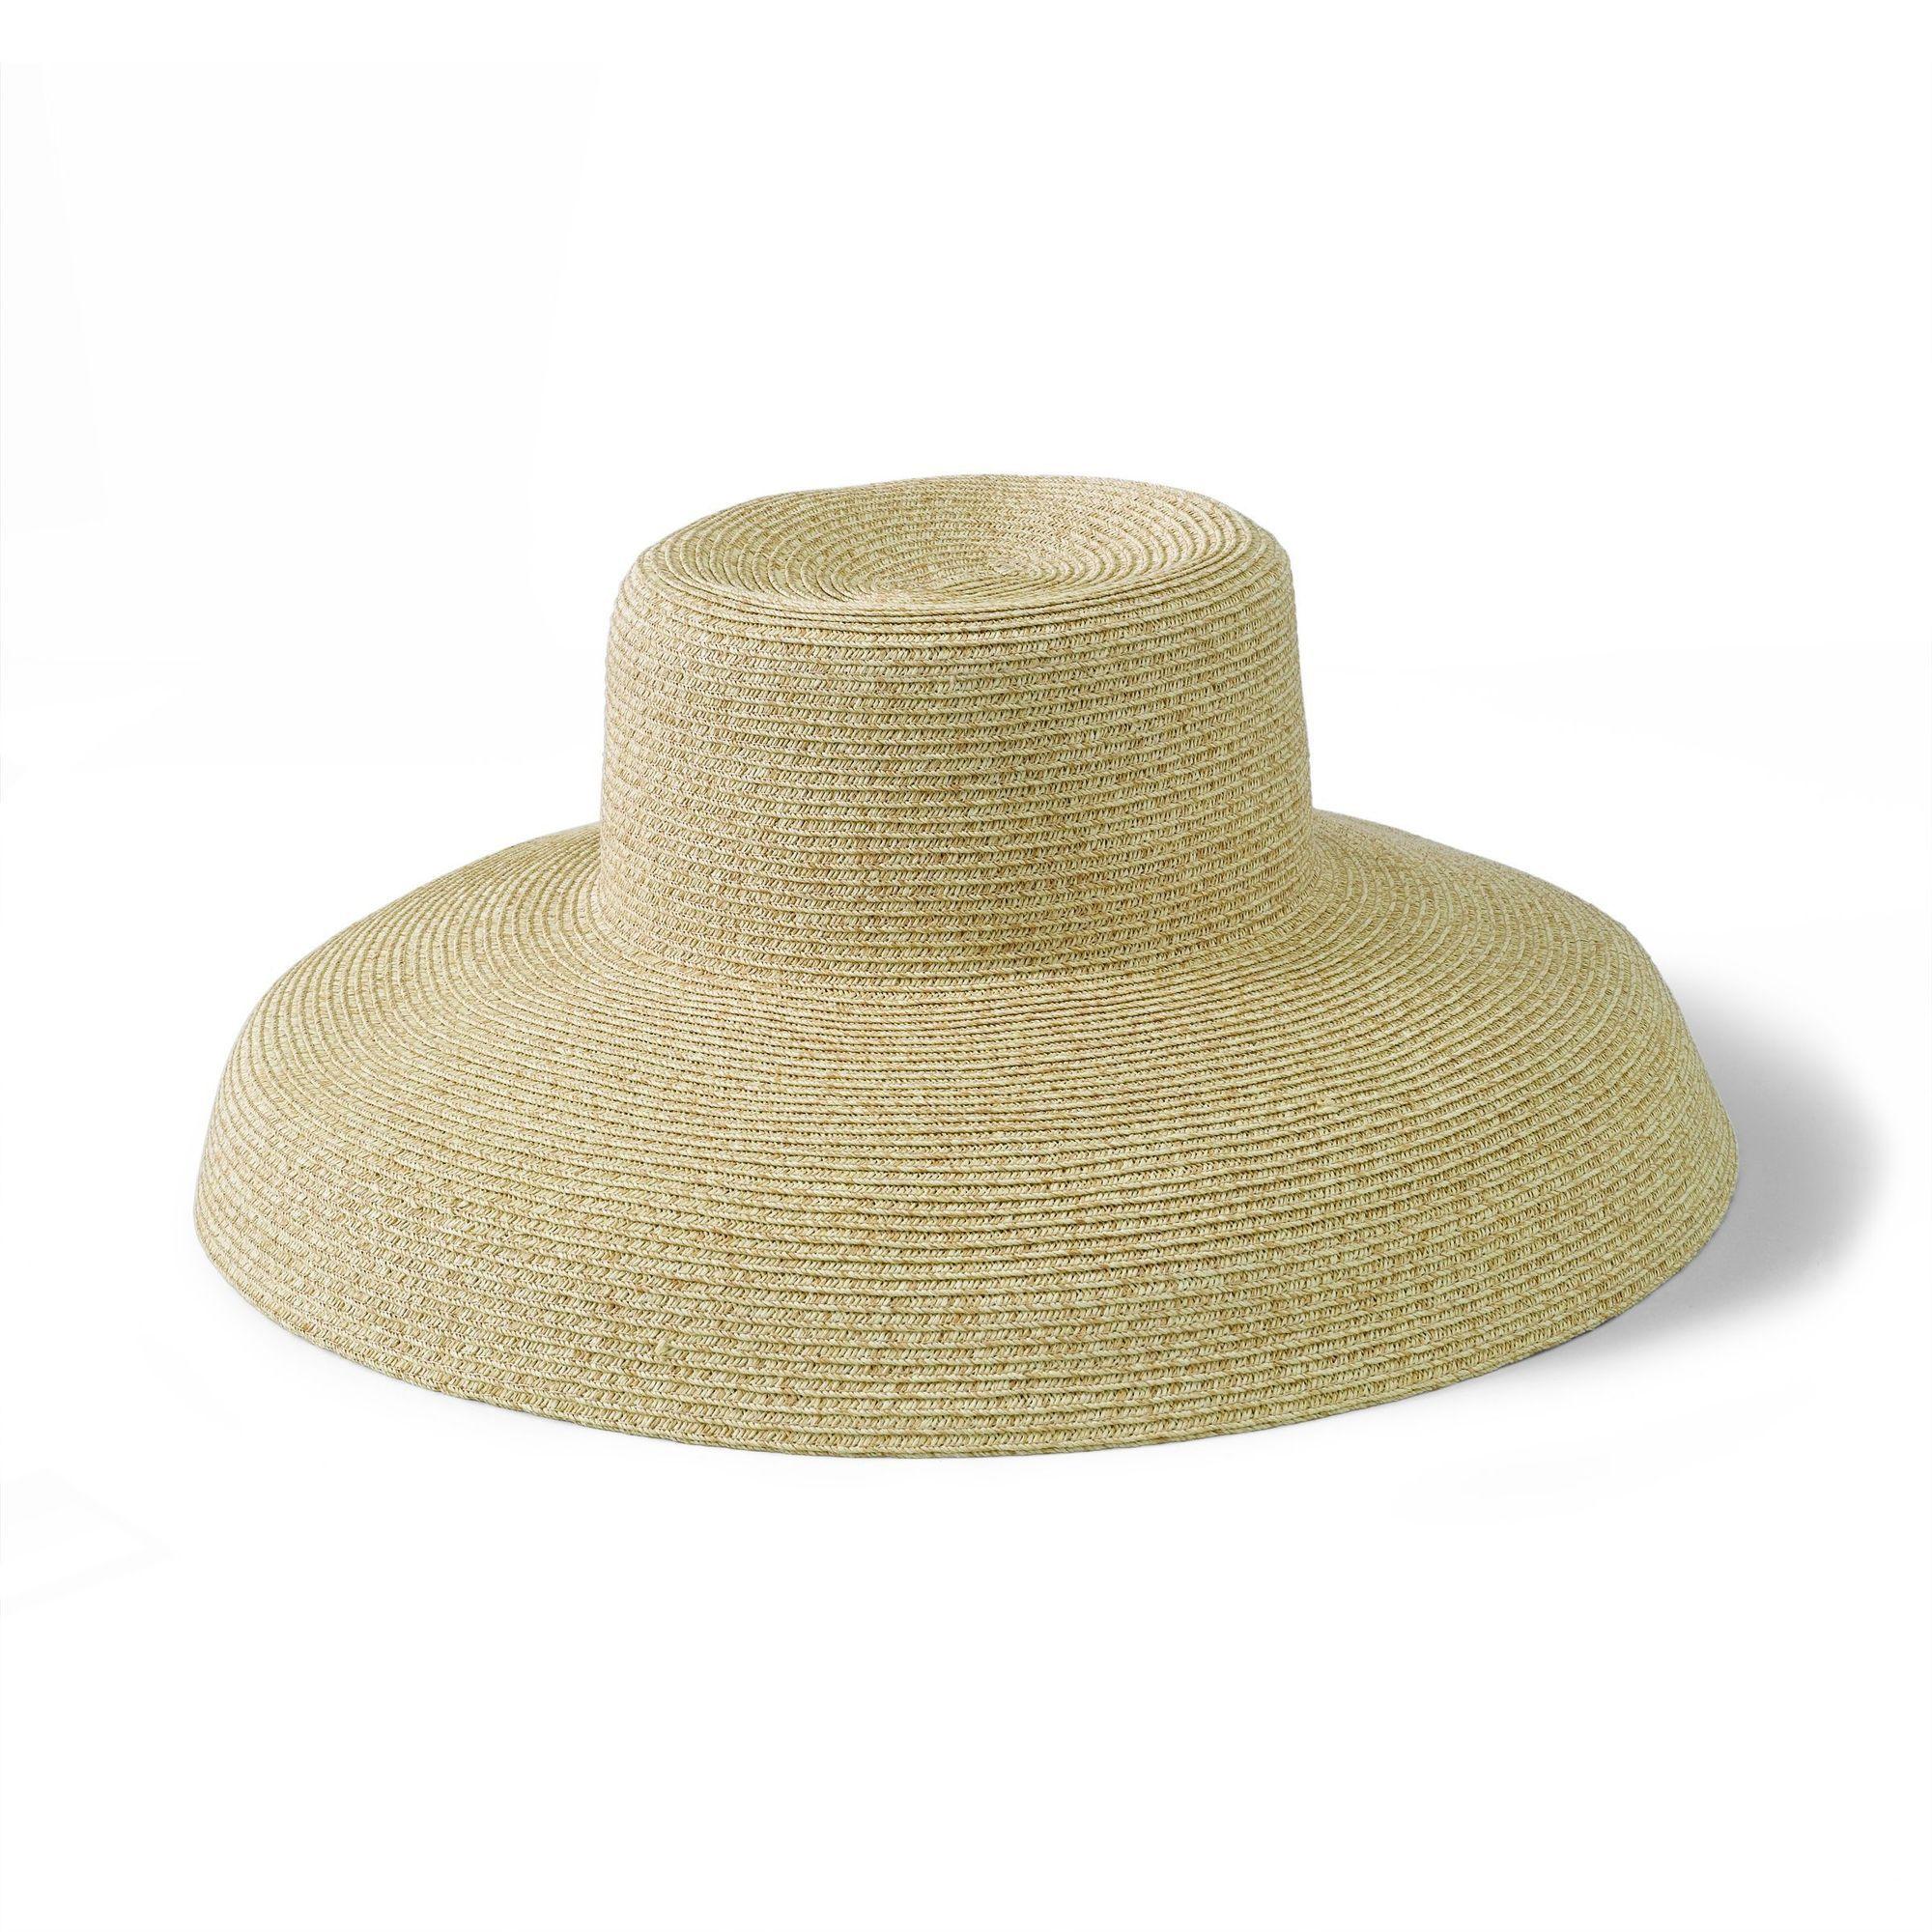 Women S Ultrabraid Xl Brim Hat Ublx108 Brim Hat Floppy Sun Hats Hats